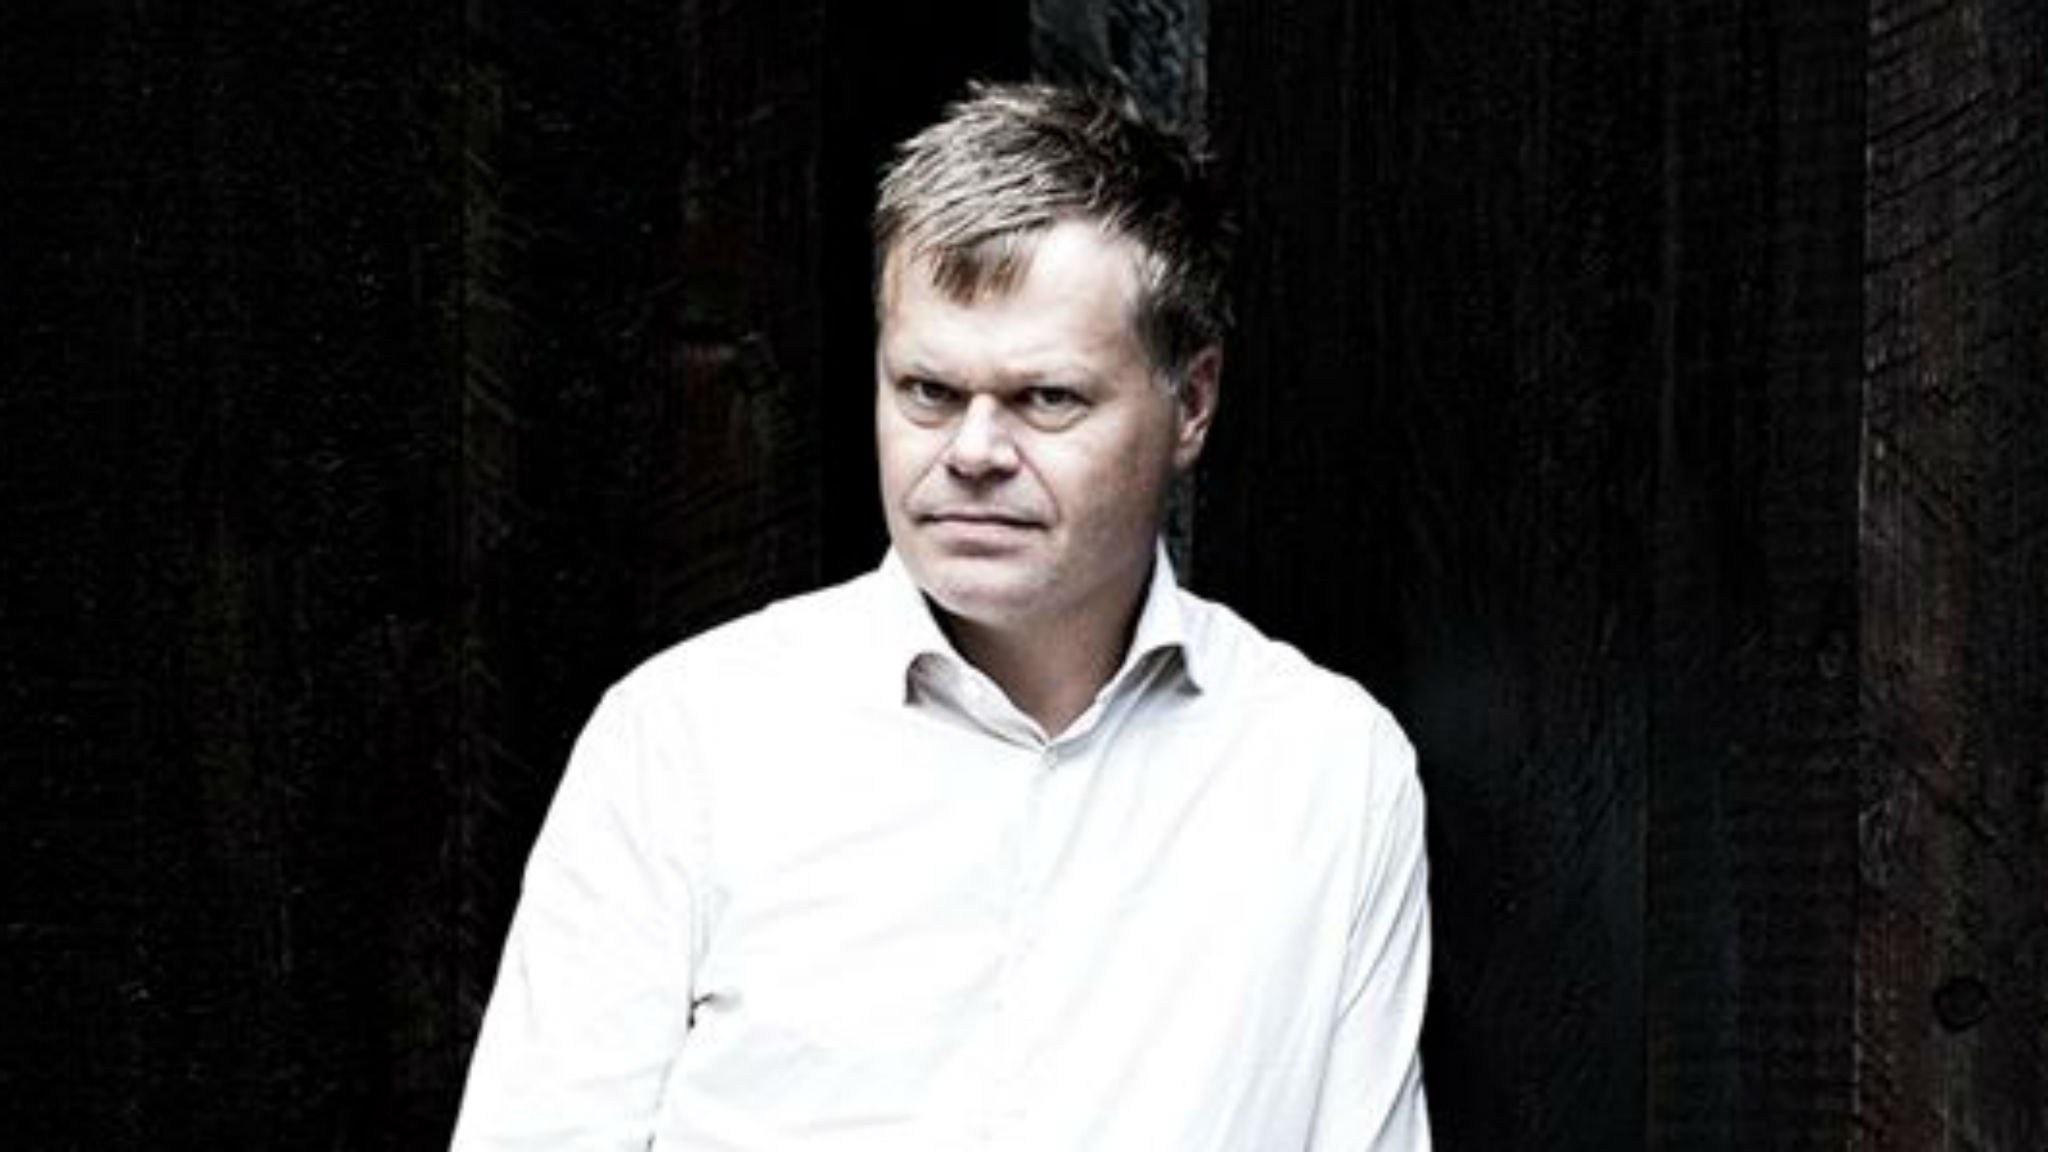 Månadens diktare: Fredrik Nyberg